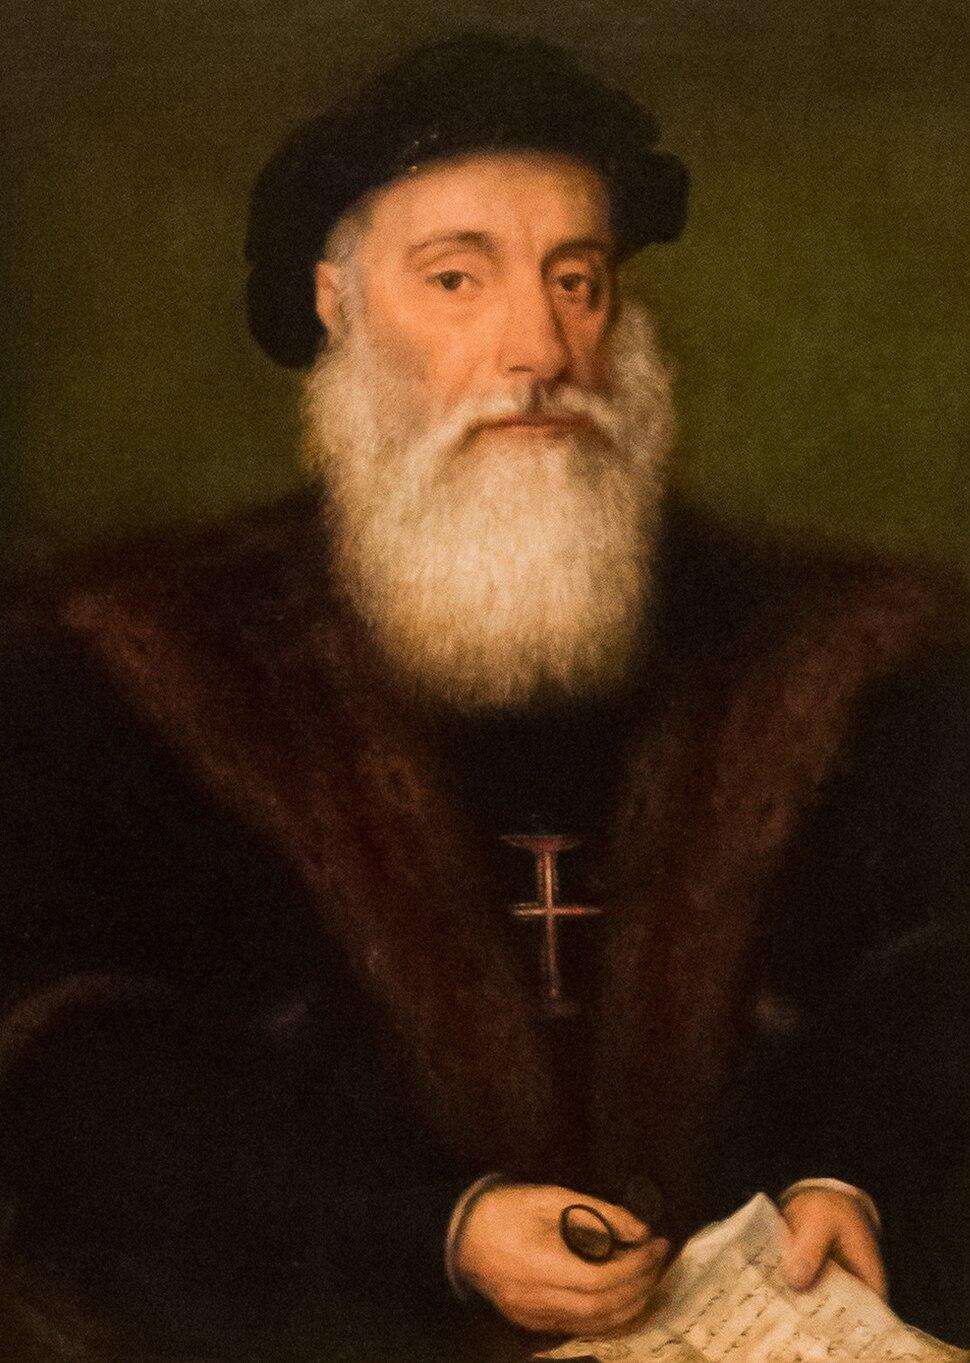 Lisboa-Museu Nacional de Arte Antiga-Retrato dito de Vasco da Gama-20140917